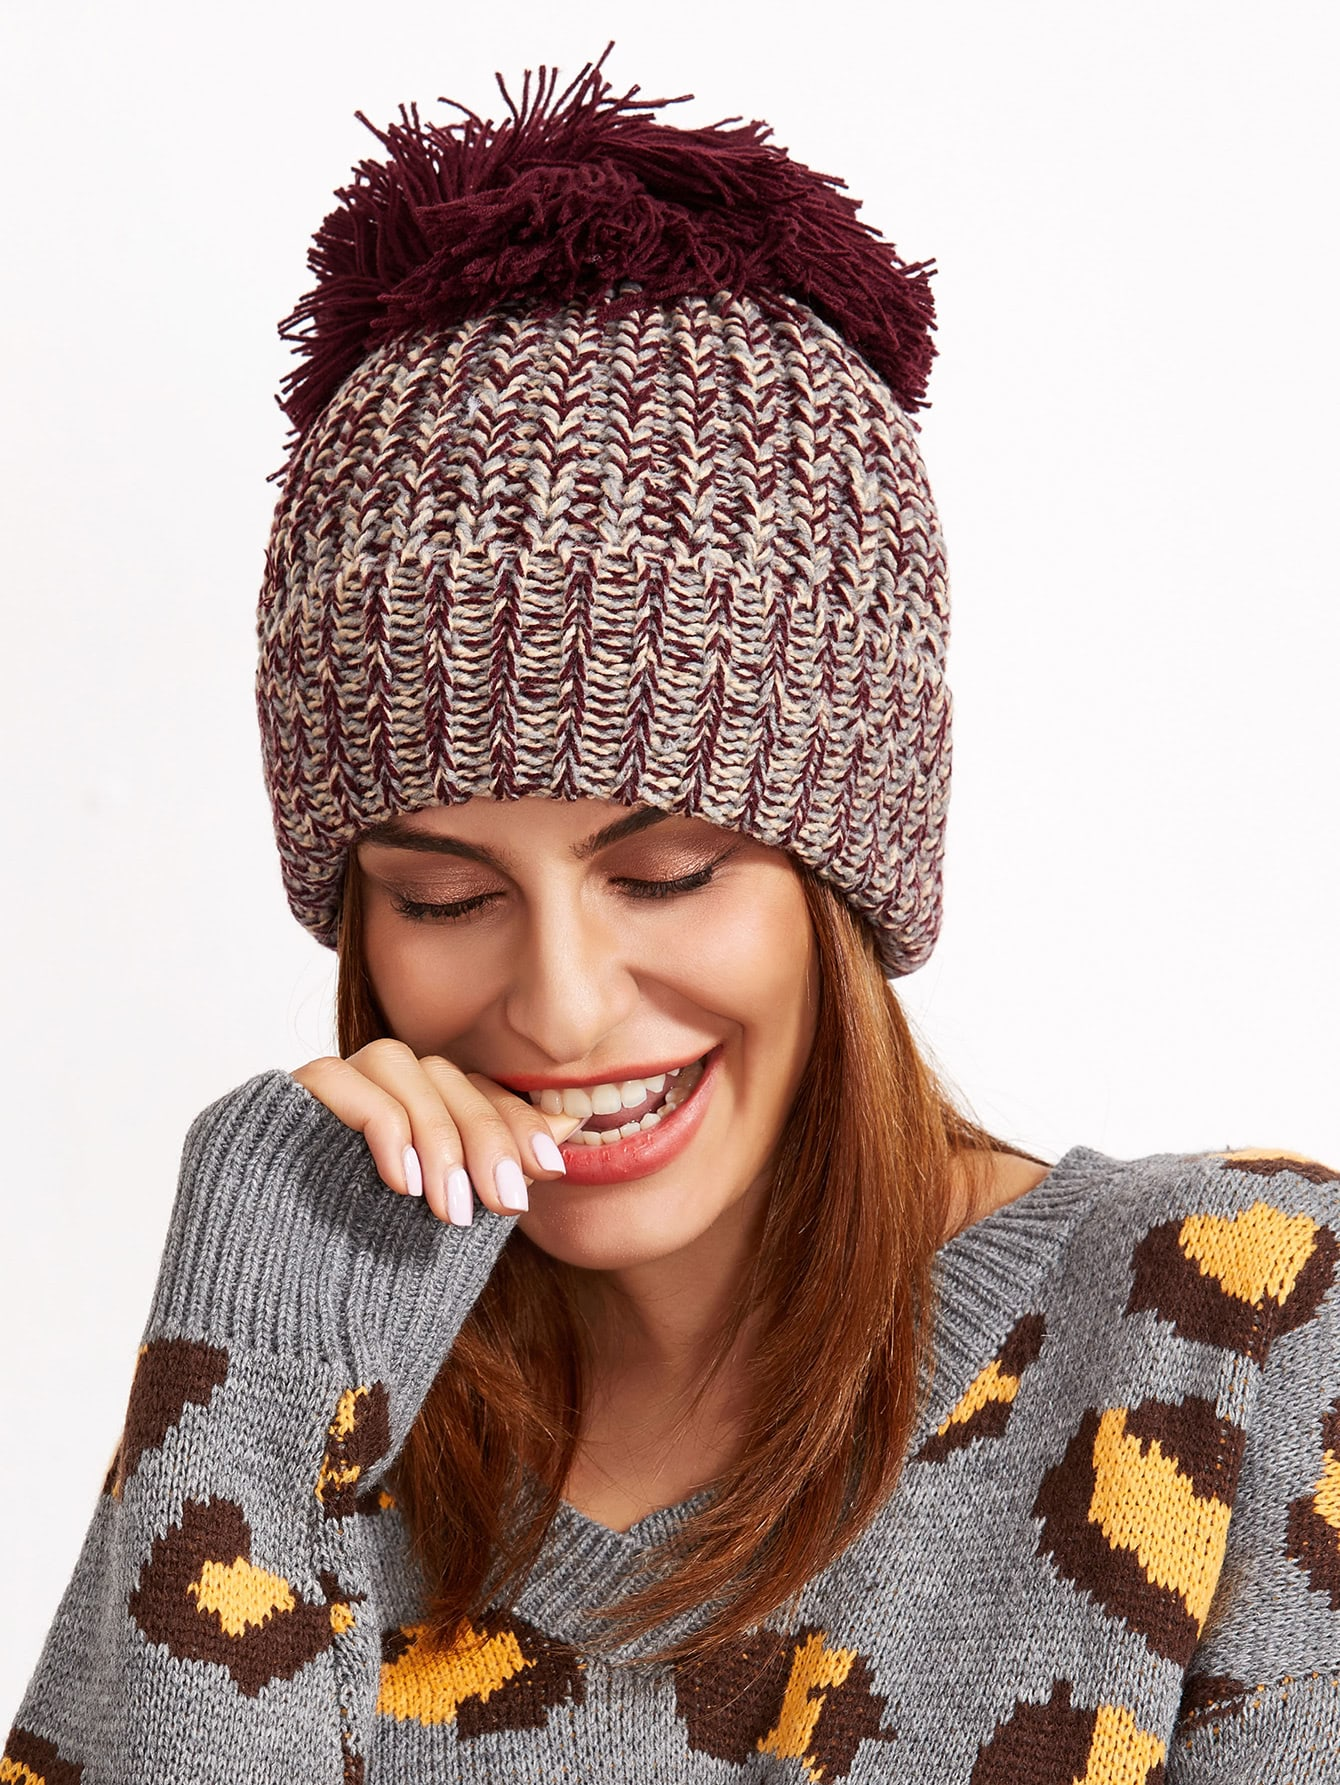 Marled Ribbed Big Pom Pom Knit Beanie Hat hat161117303